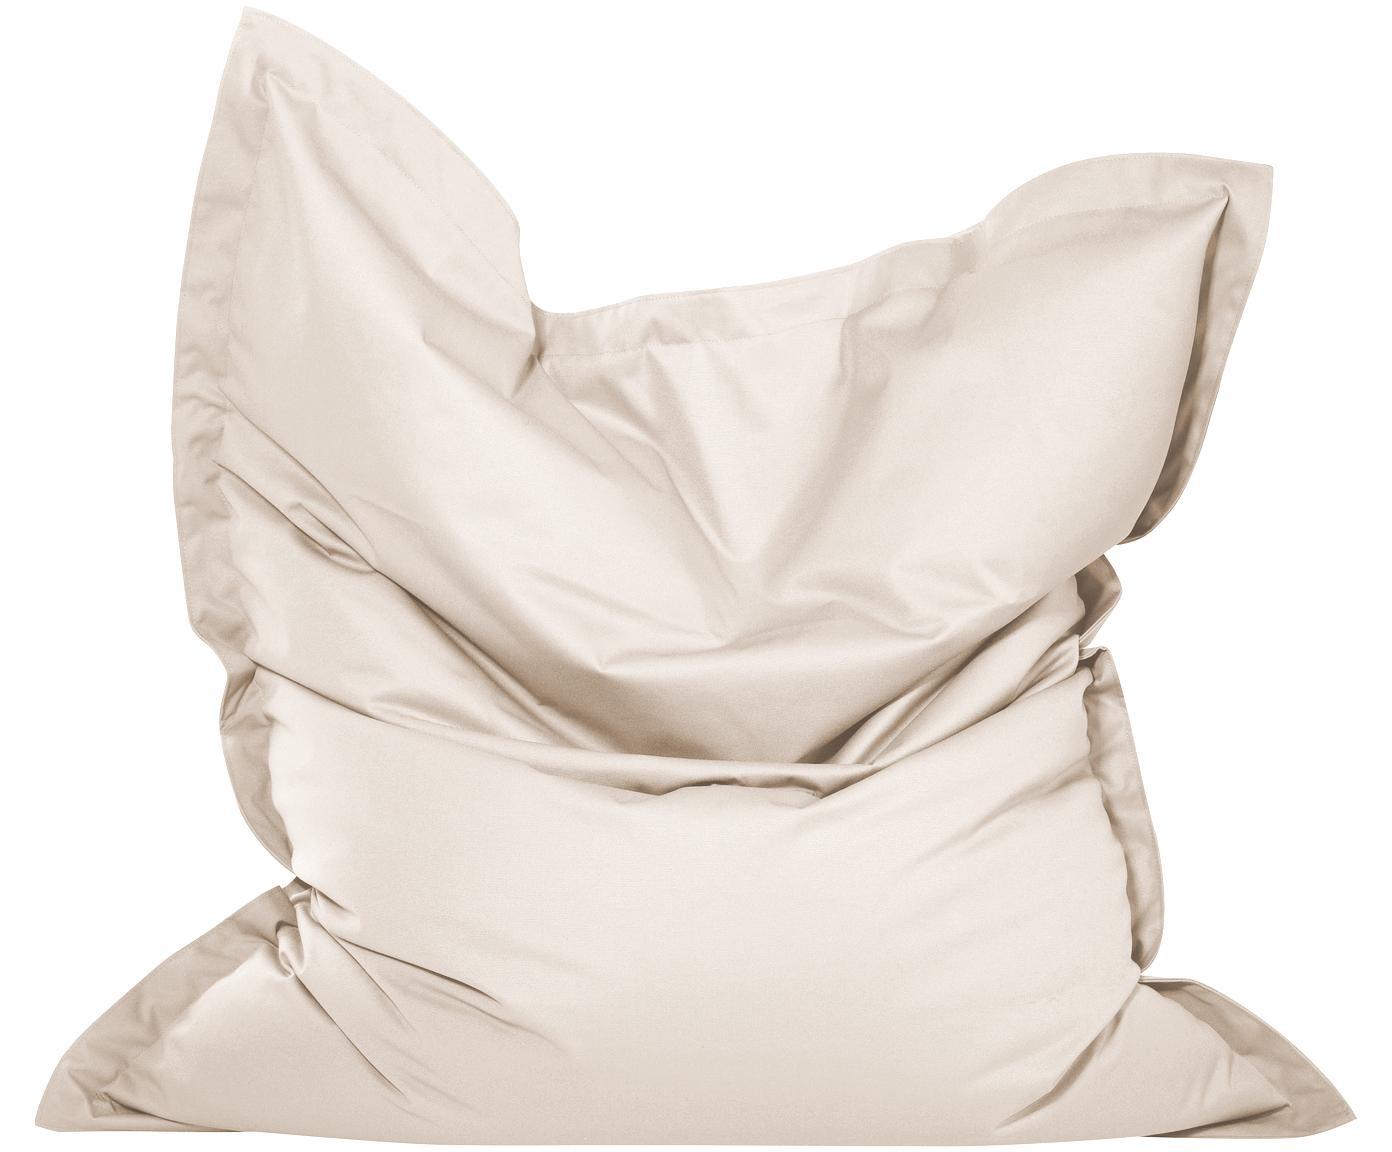 Outdoor zitzak Wave, Bekleding: 75% katoen, 25% polyester, Crèmekleurig, 130 x 160 cm